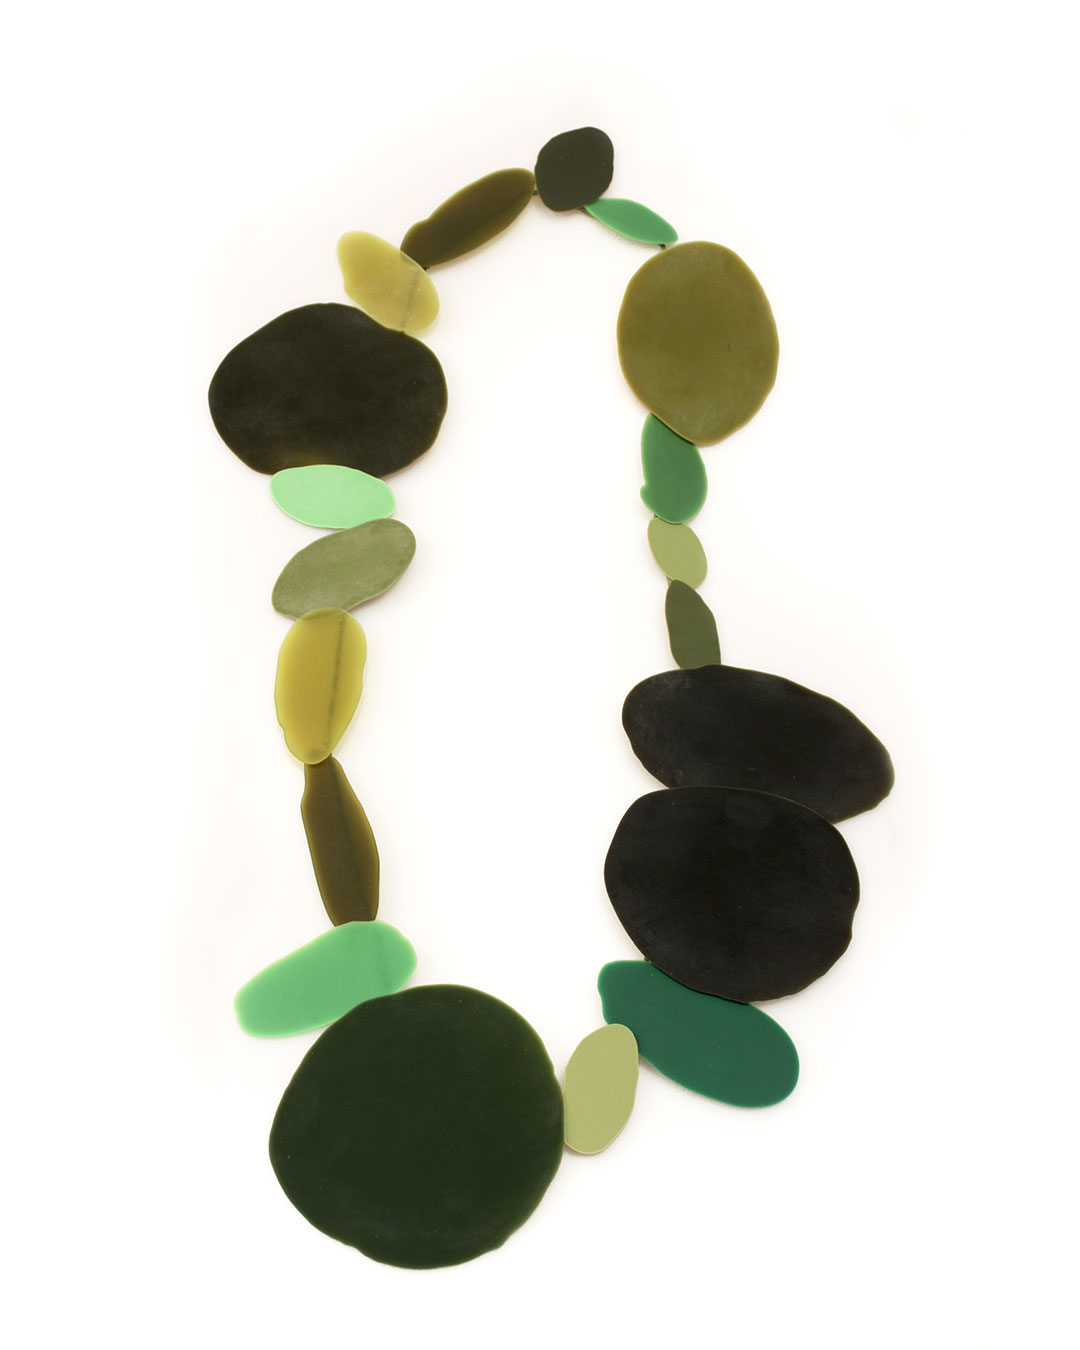 Ela Bauer, necklace, 2020, hars, pigment, jade, 700 x 400 x 15 mm, verkocht